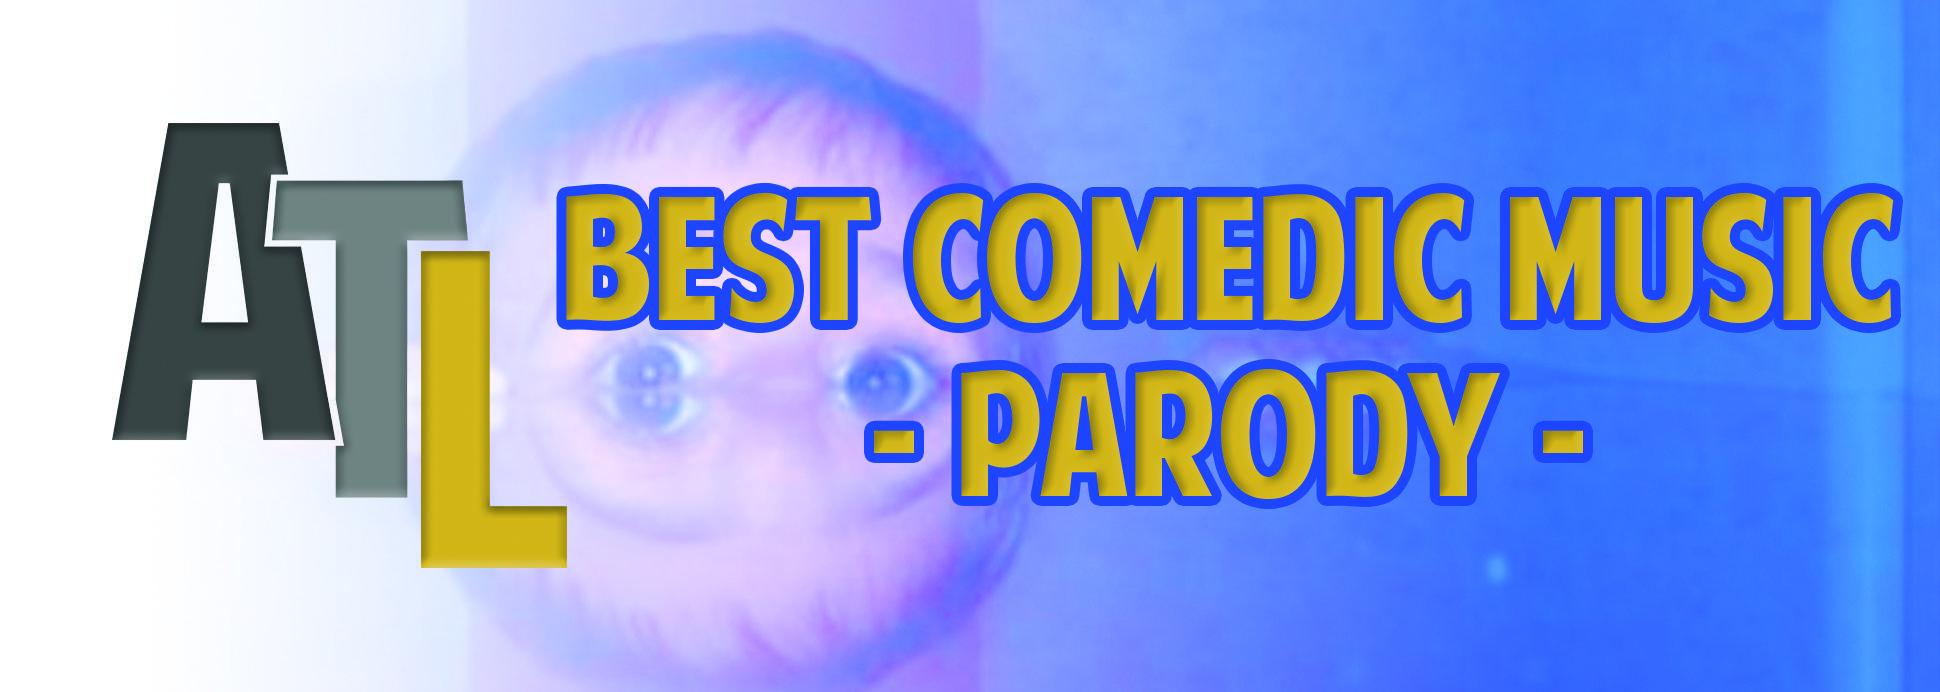 Best Comedic Music - Parody